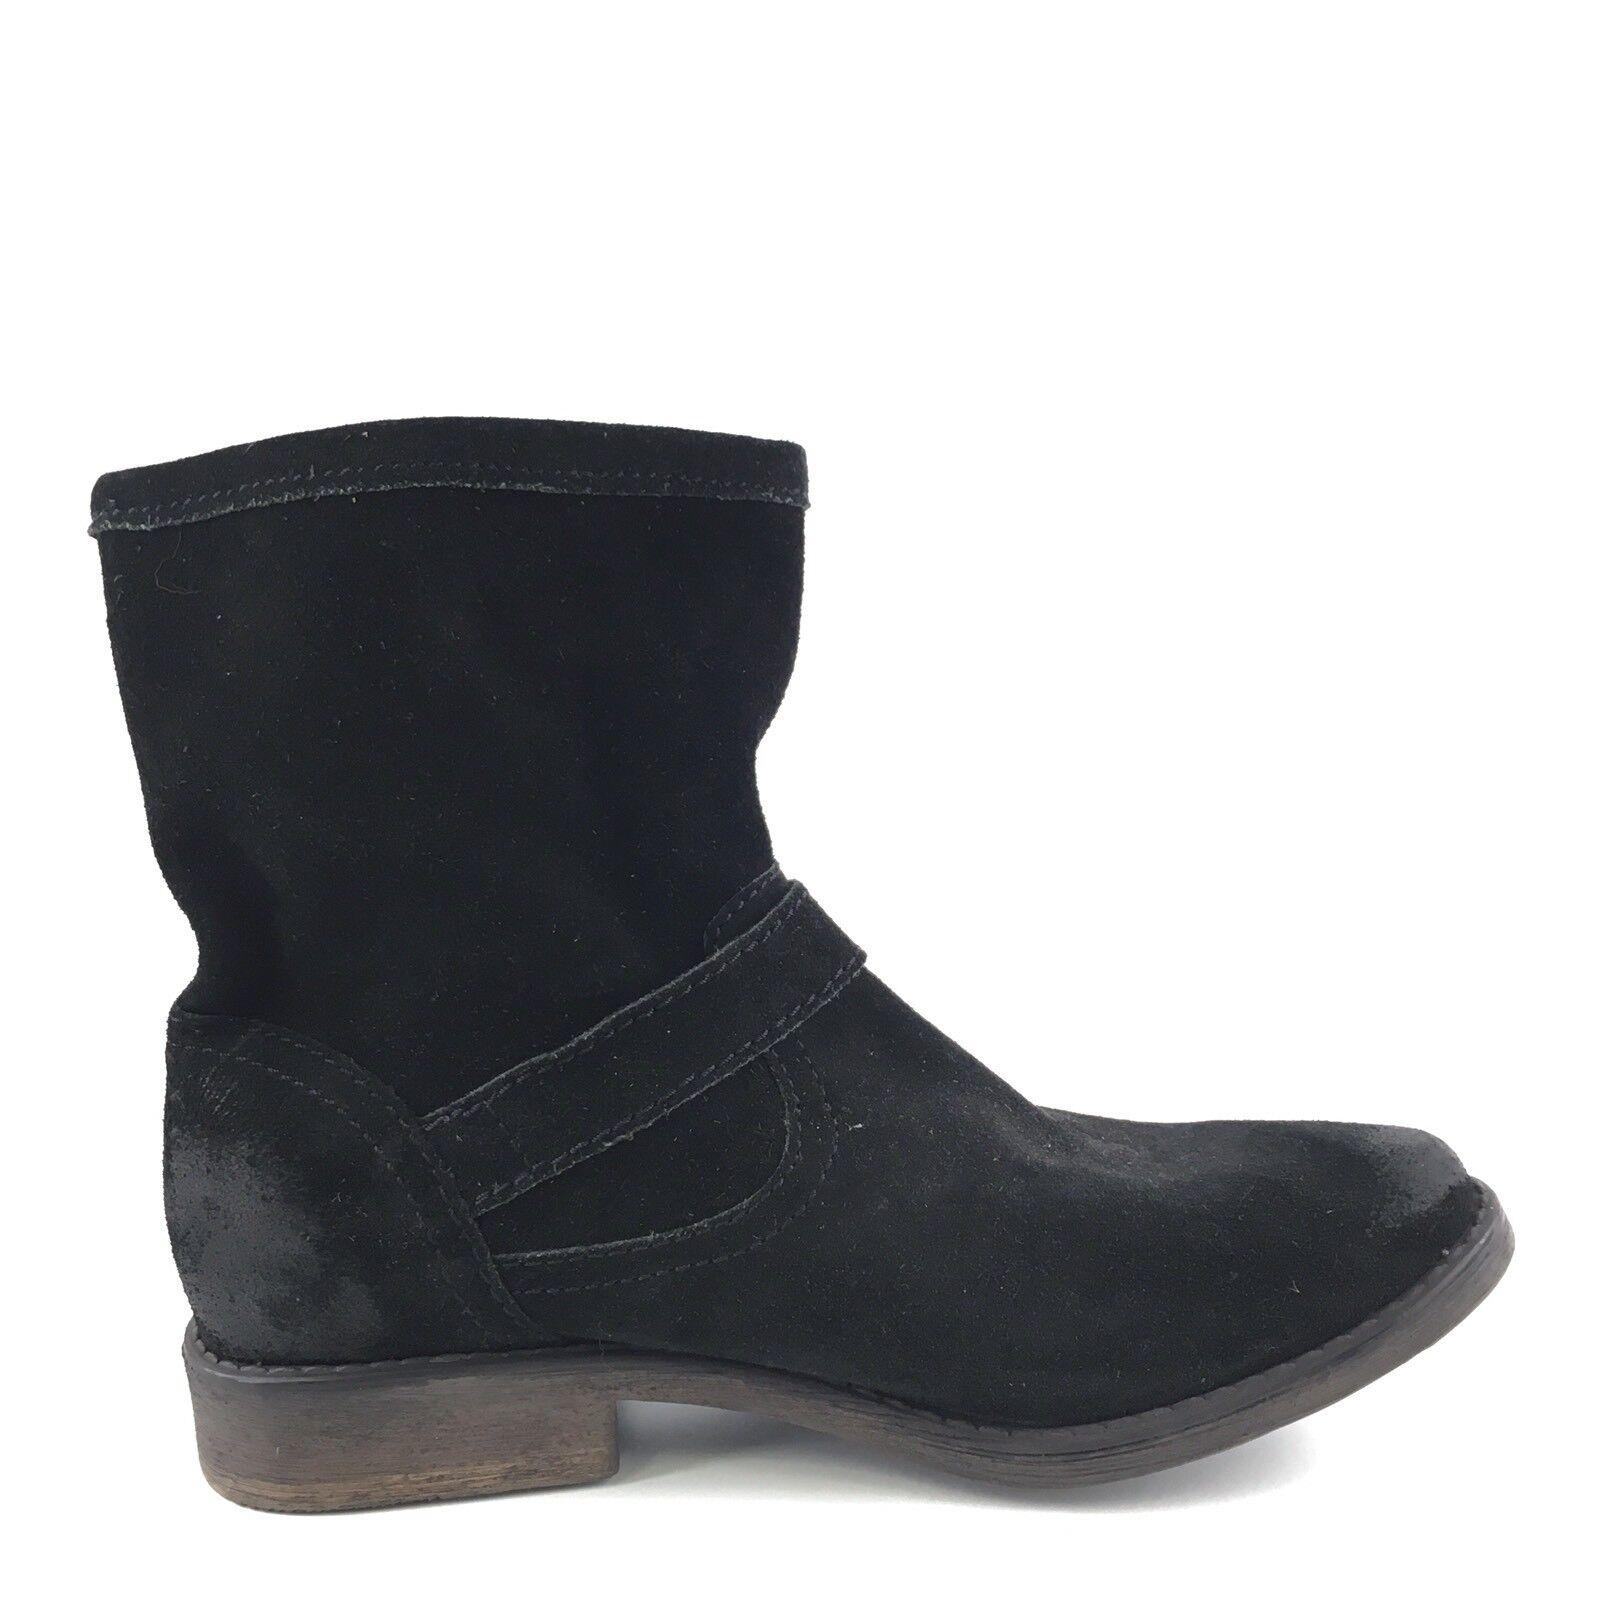 ZIGI Girl Corree Black Suede Buckle Buckle Buckle Ankle Boots Women's Size 7 M 278d01